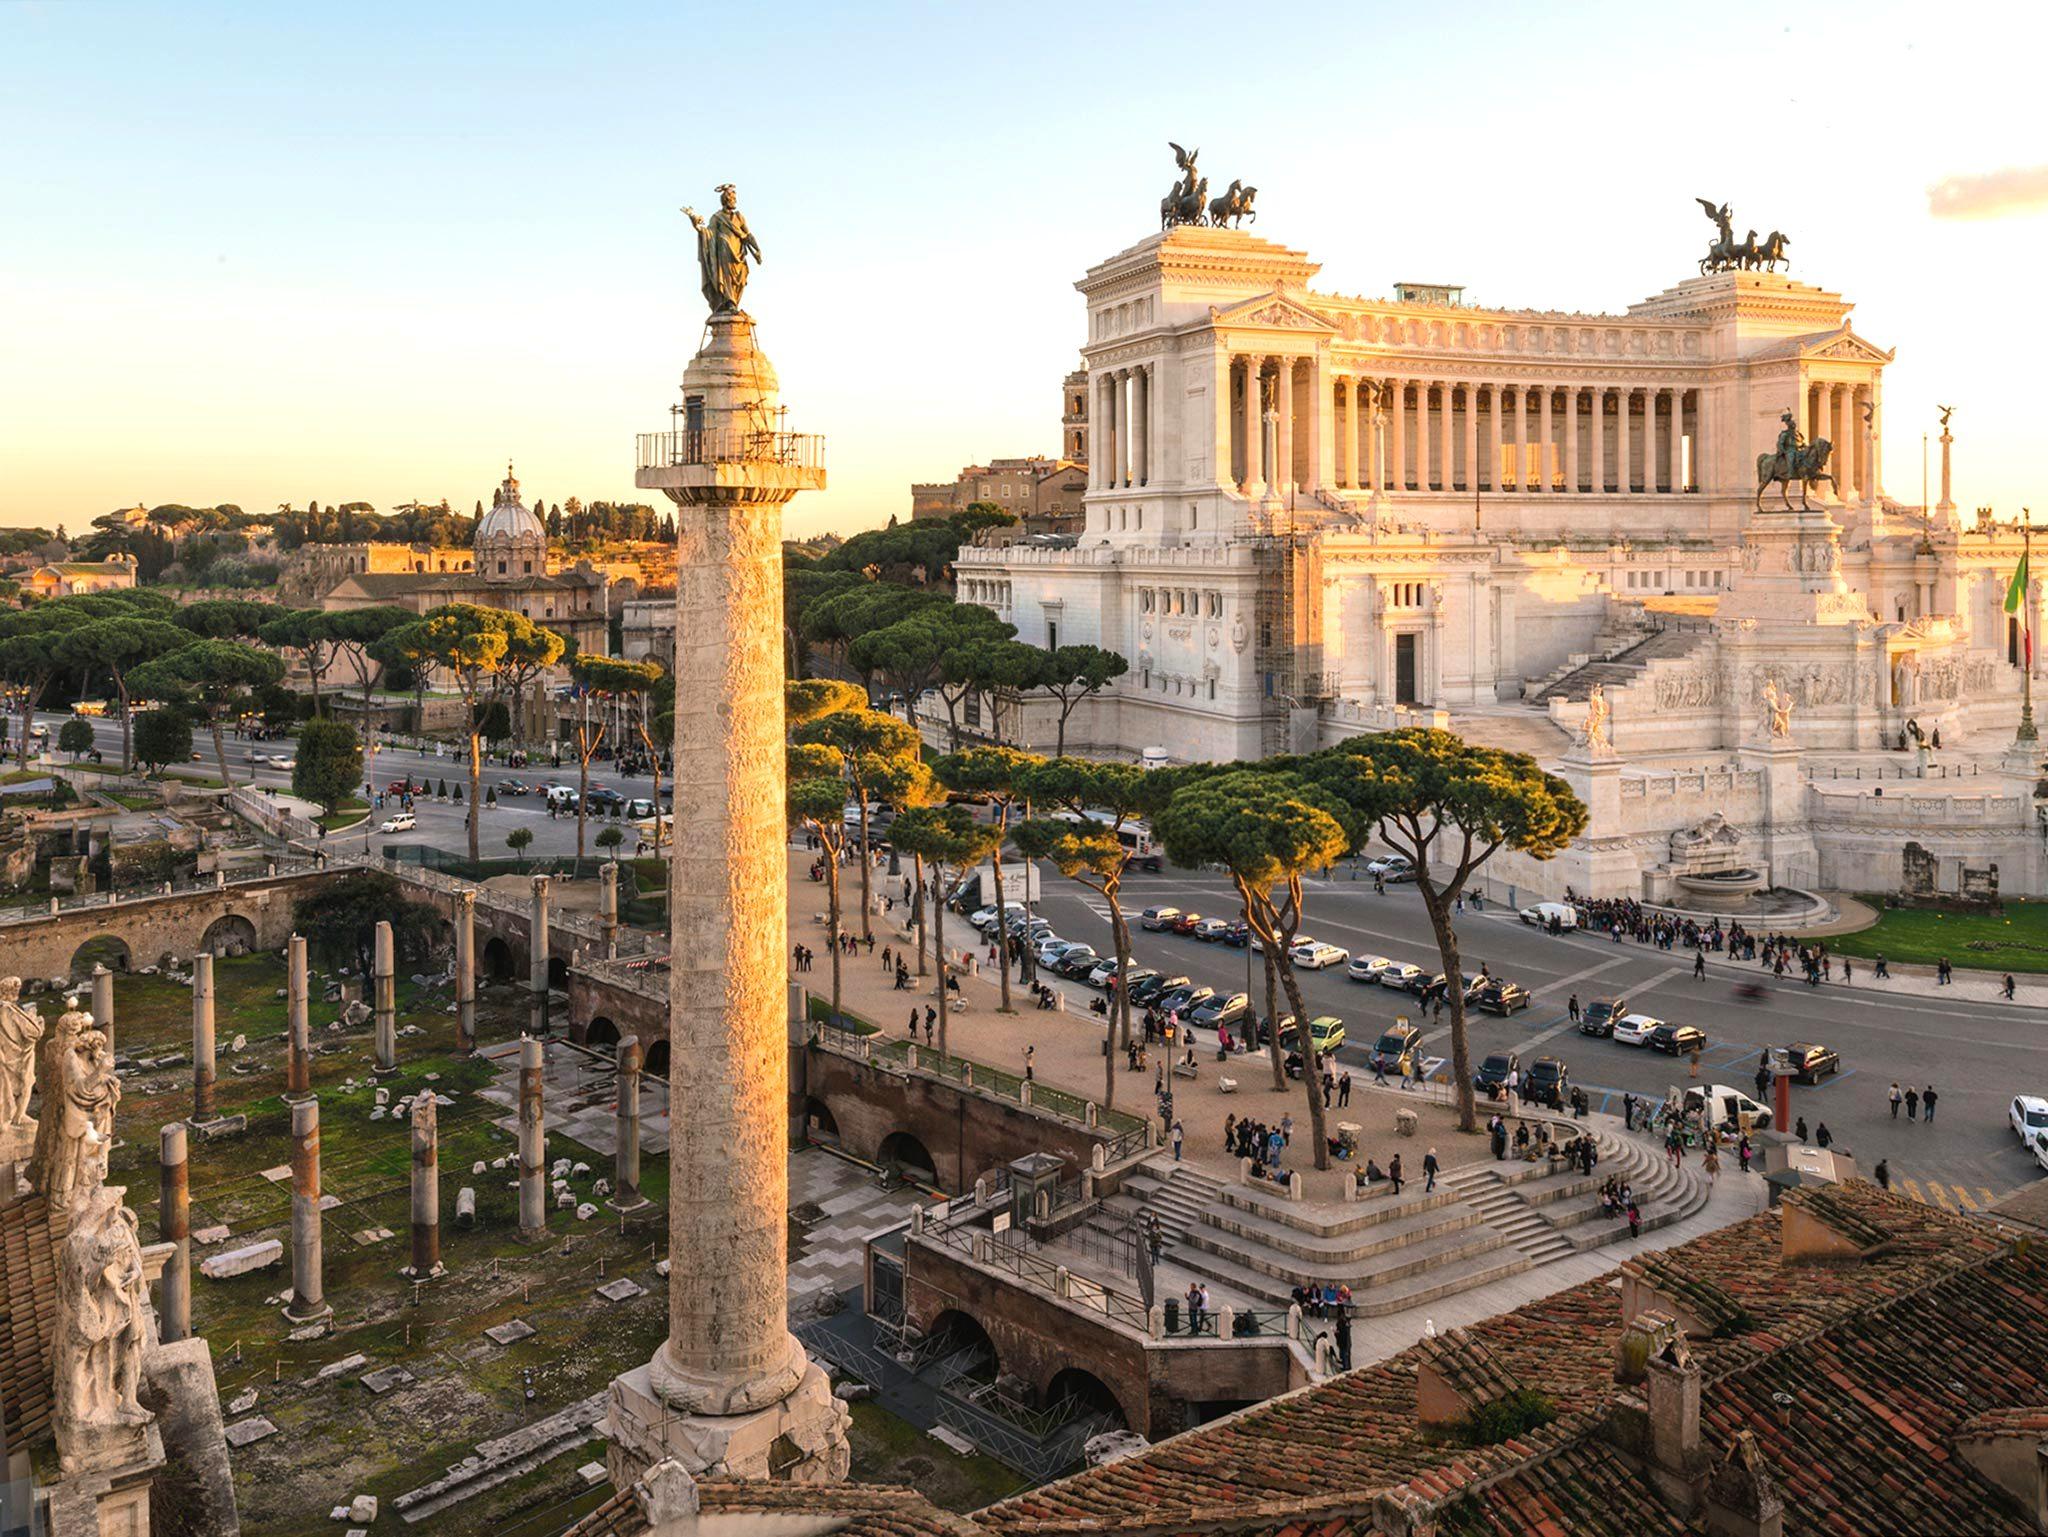 The Trajan's Column and the Vittorio Emanuele Monument on Piazza Venezia